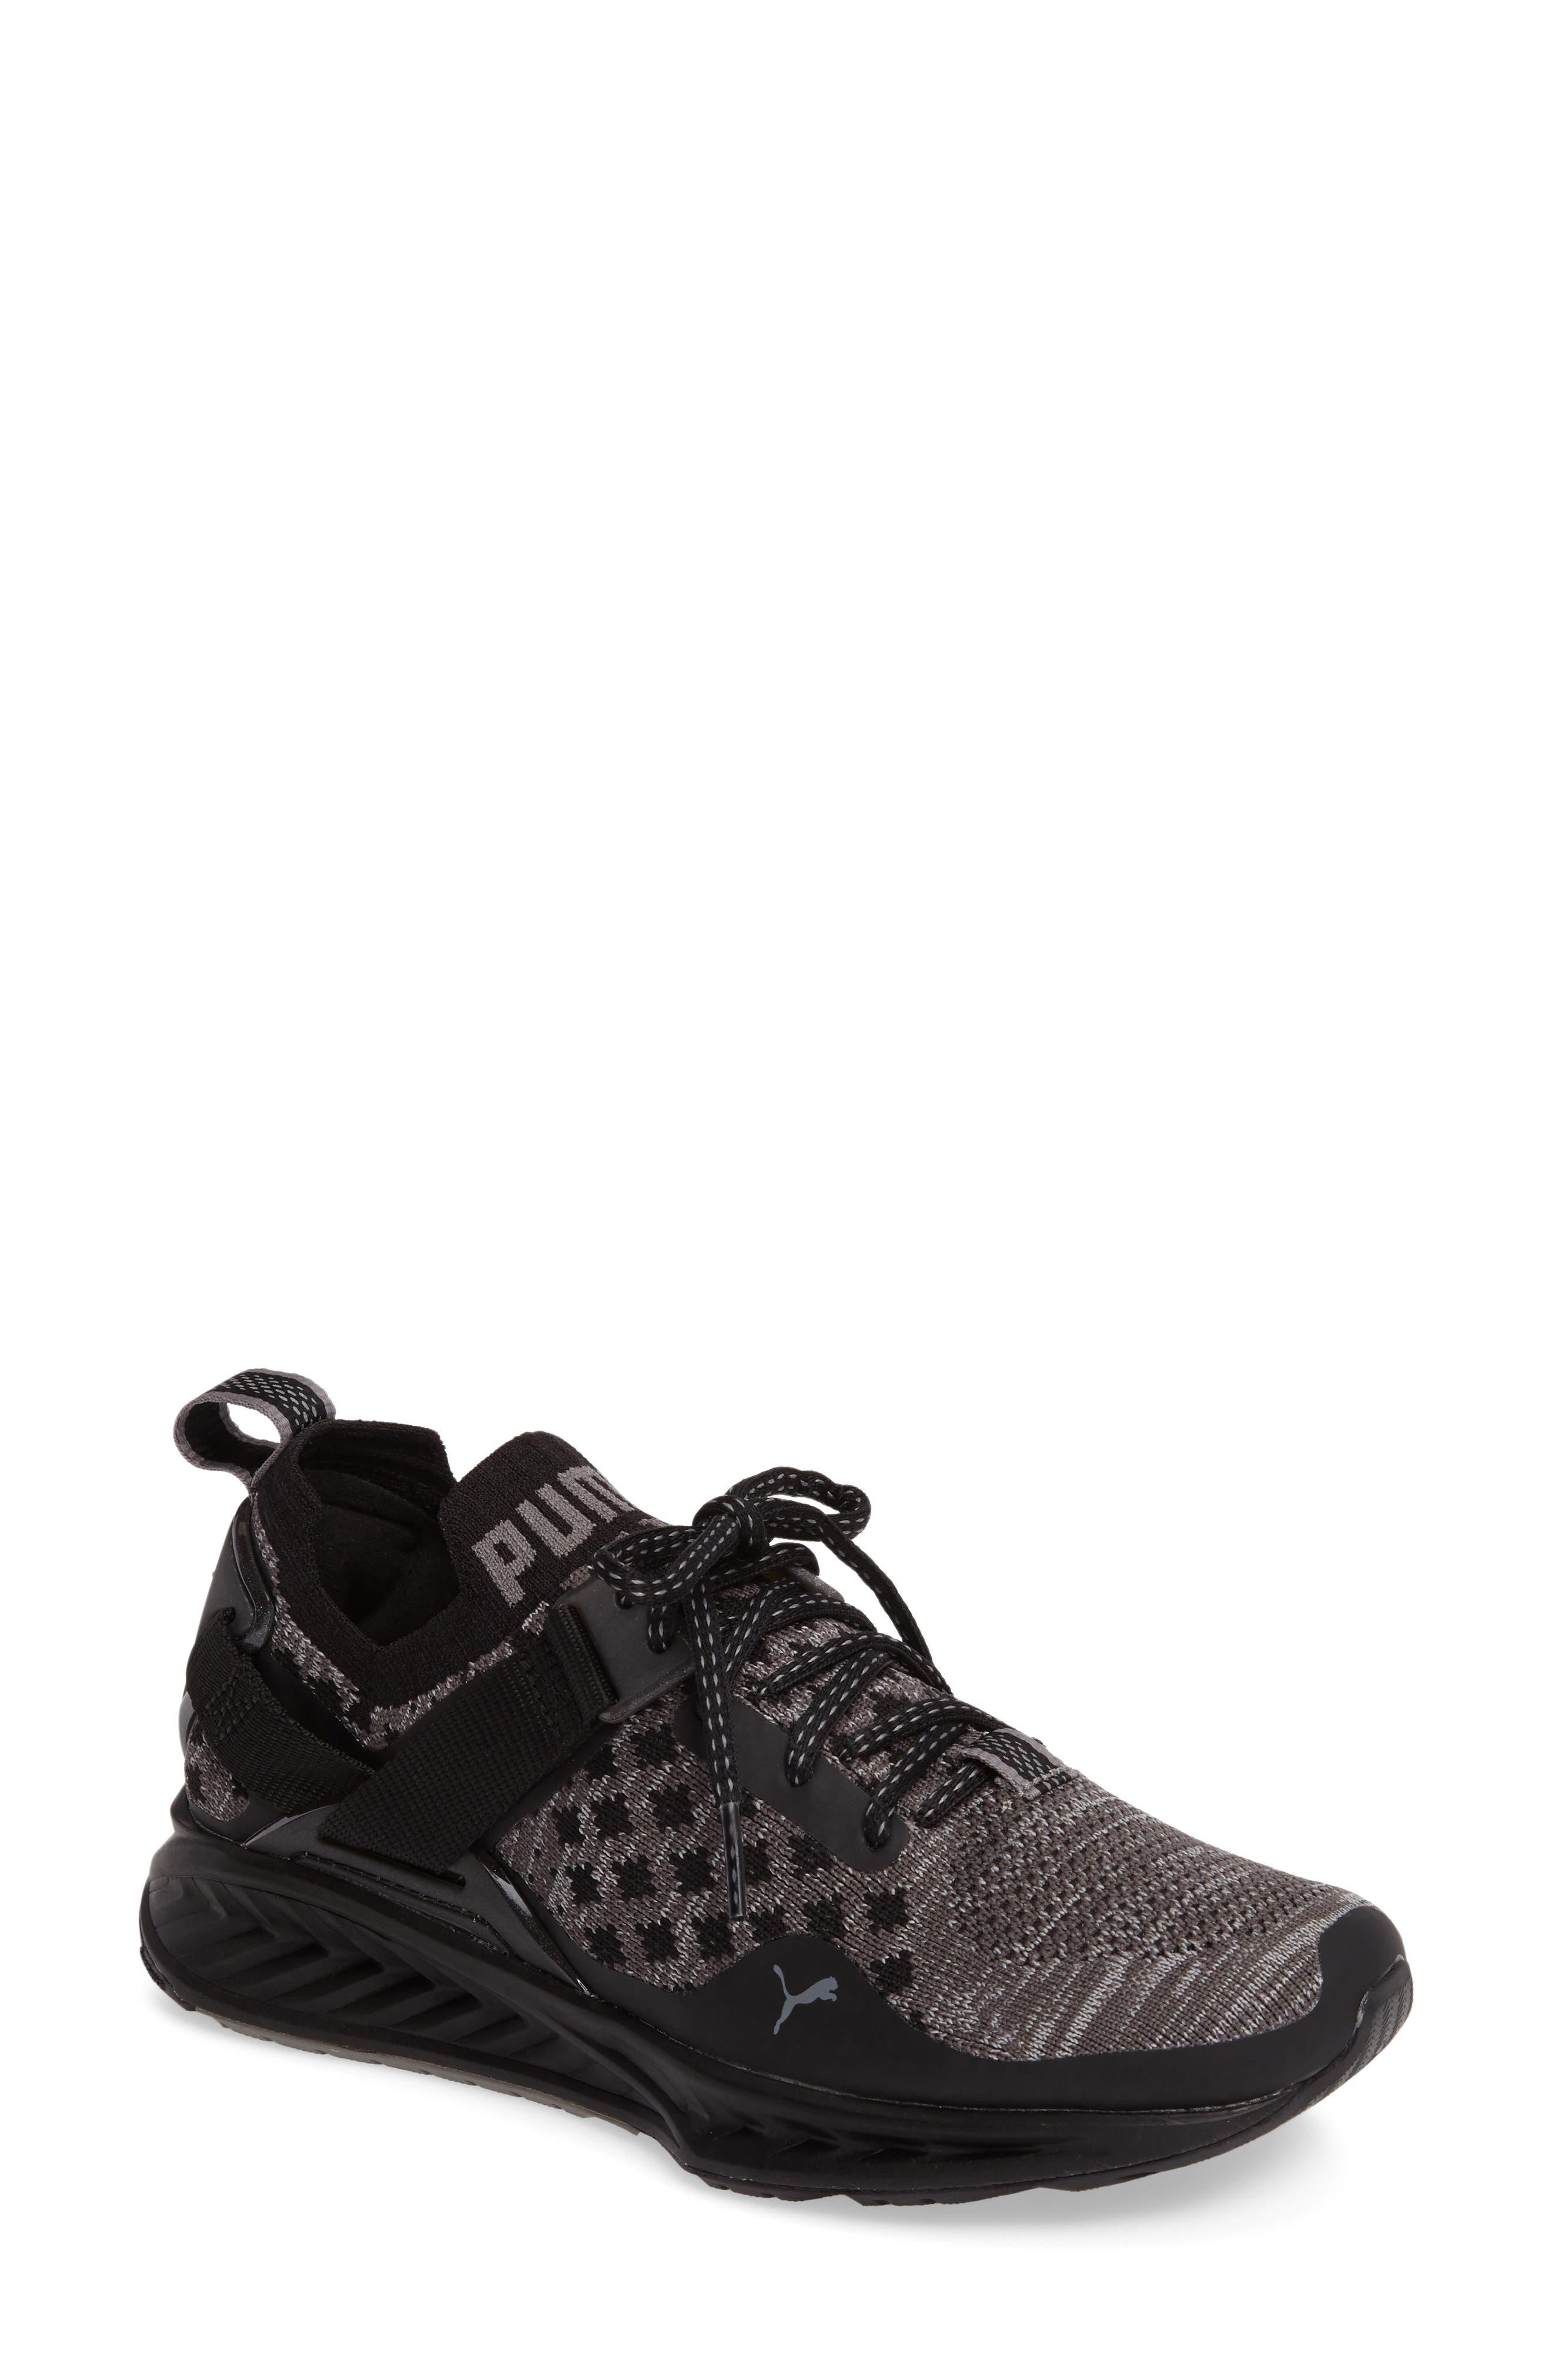 PUMA IGNITE evoKNIT Low Sneaker